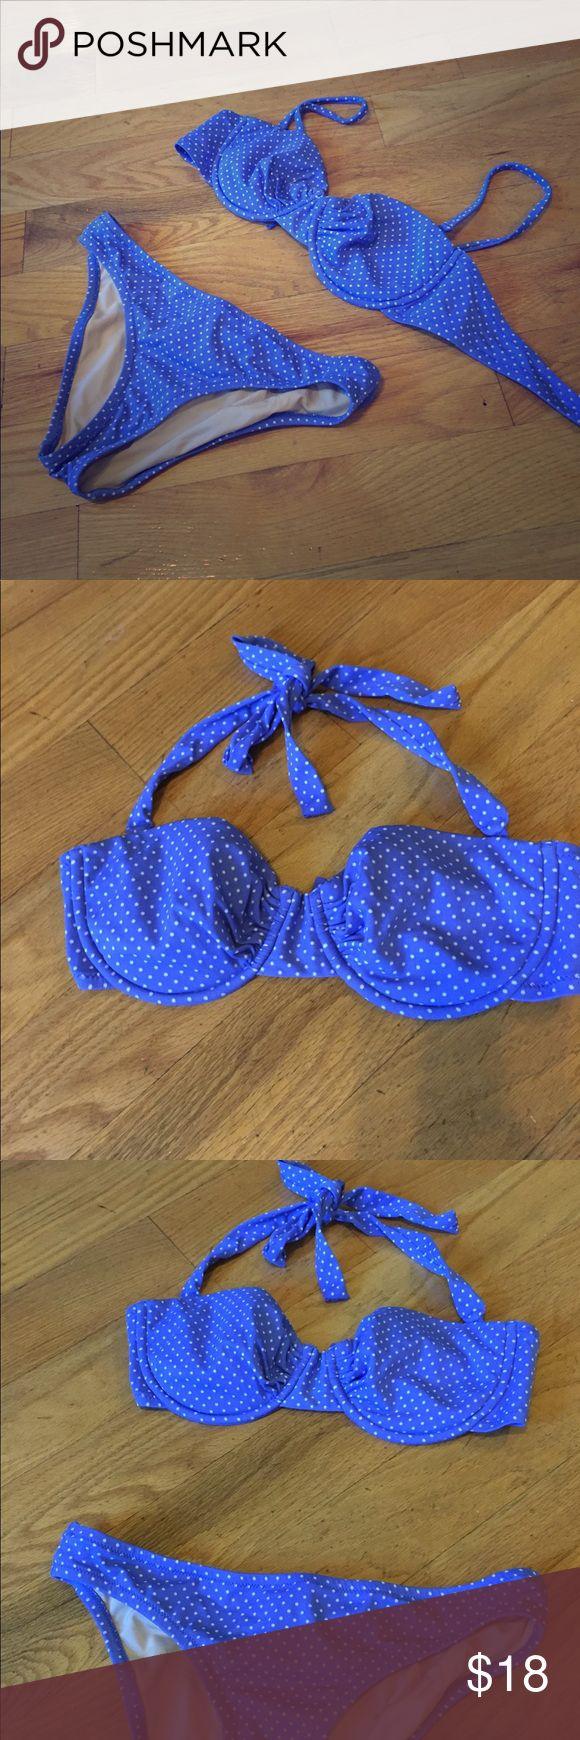 J.Crew periwinkle polka dot bikini Really cute periwinkle blue polka dot bikini, used only a few times. Bottom is small, top is 8 (I'm 34C) J. Crew Swim Bikinis